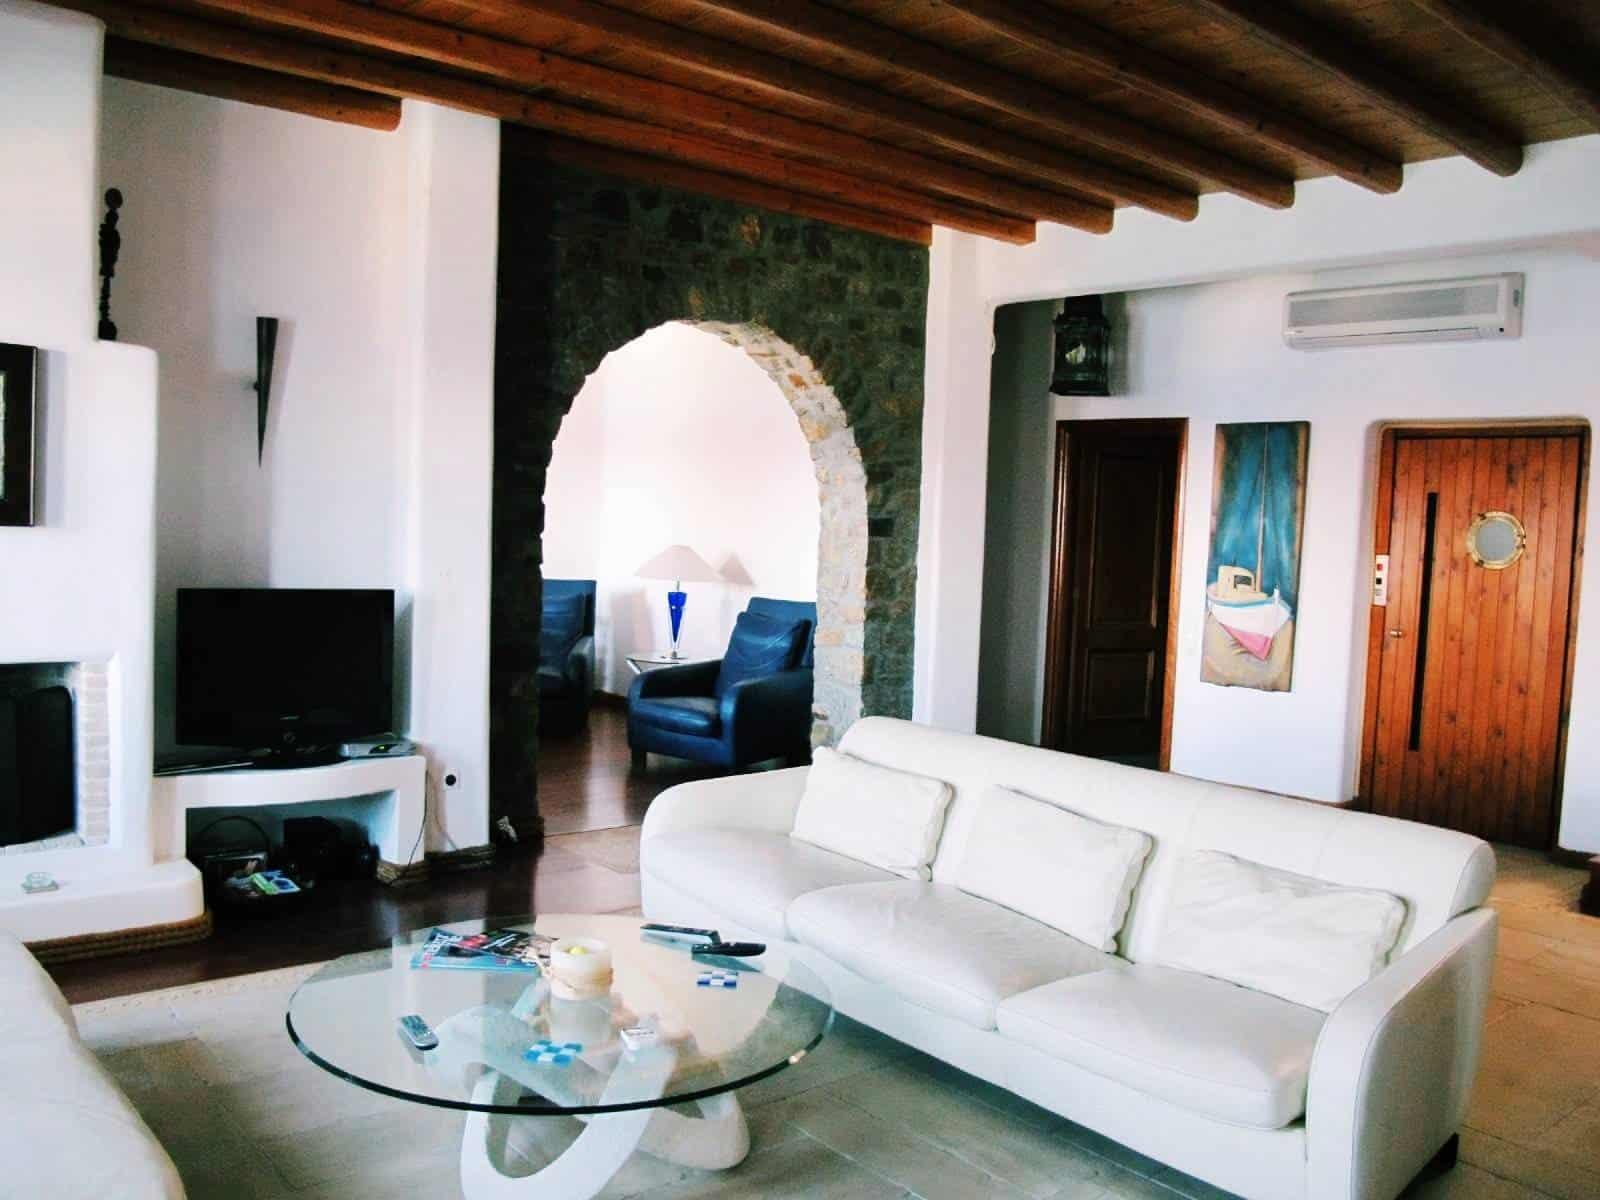 luxurious villa Mykonos - πολυτελής βίλα Μύκονος - mykonos services - οικοδομικές εργασίες 12